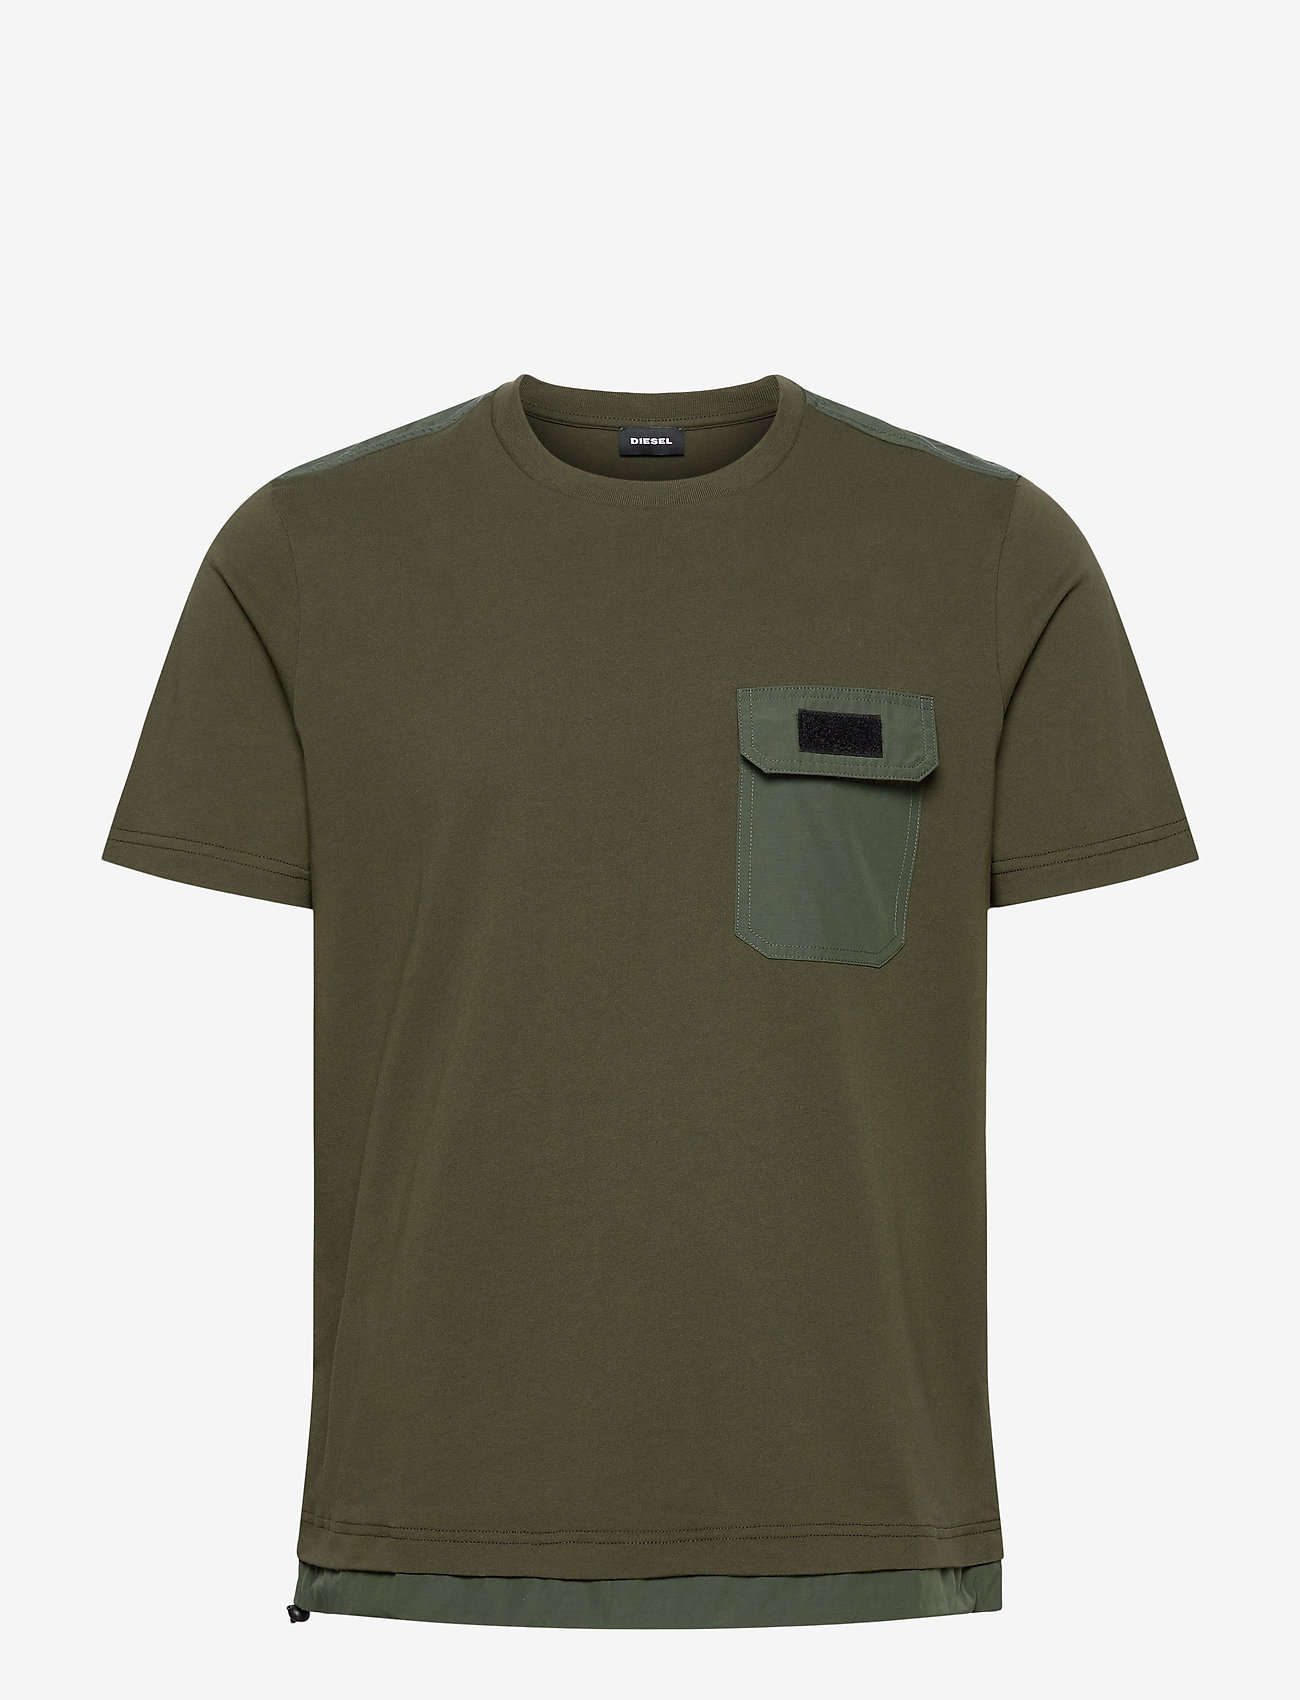 Diesel Men - T-ARMI T-SHIRT - basic t-shirts - green - 0